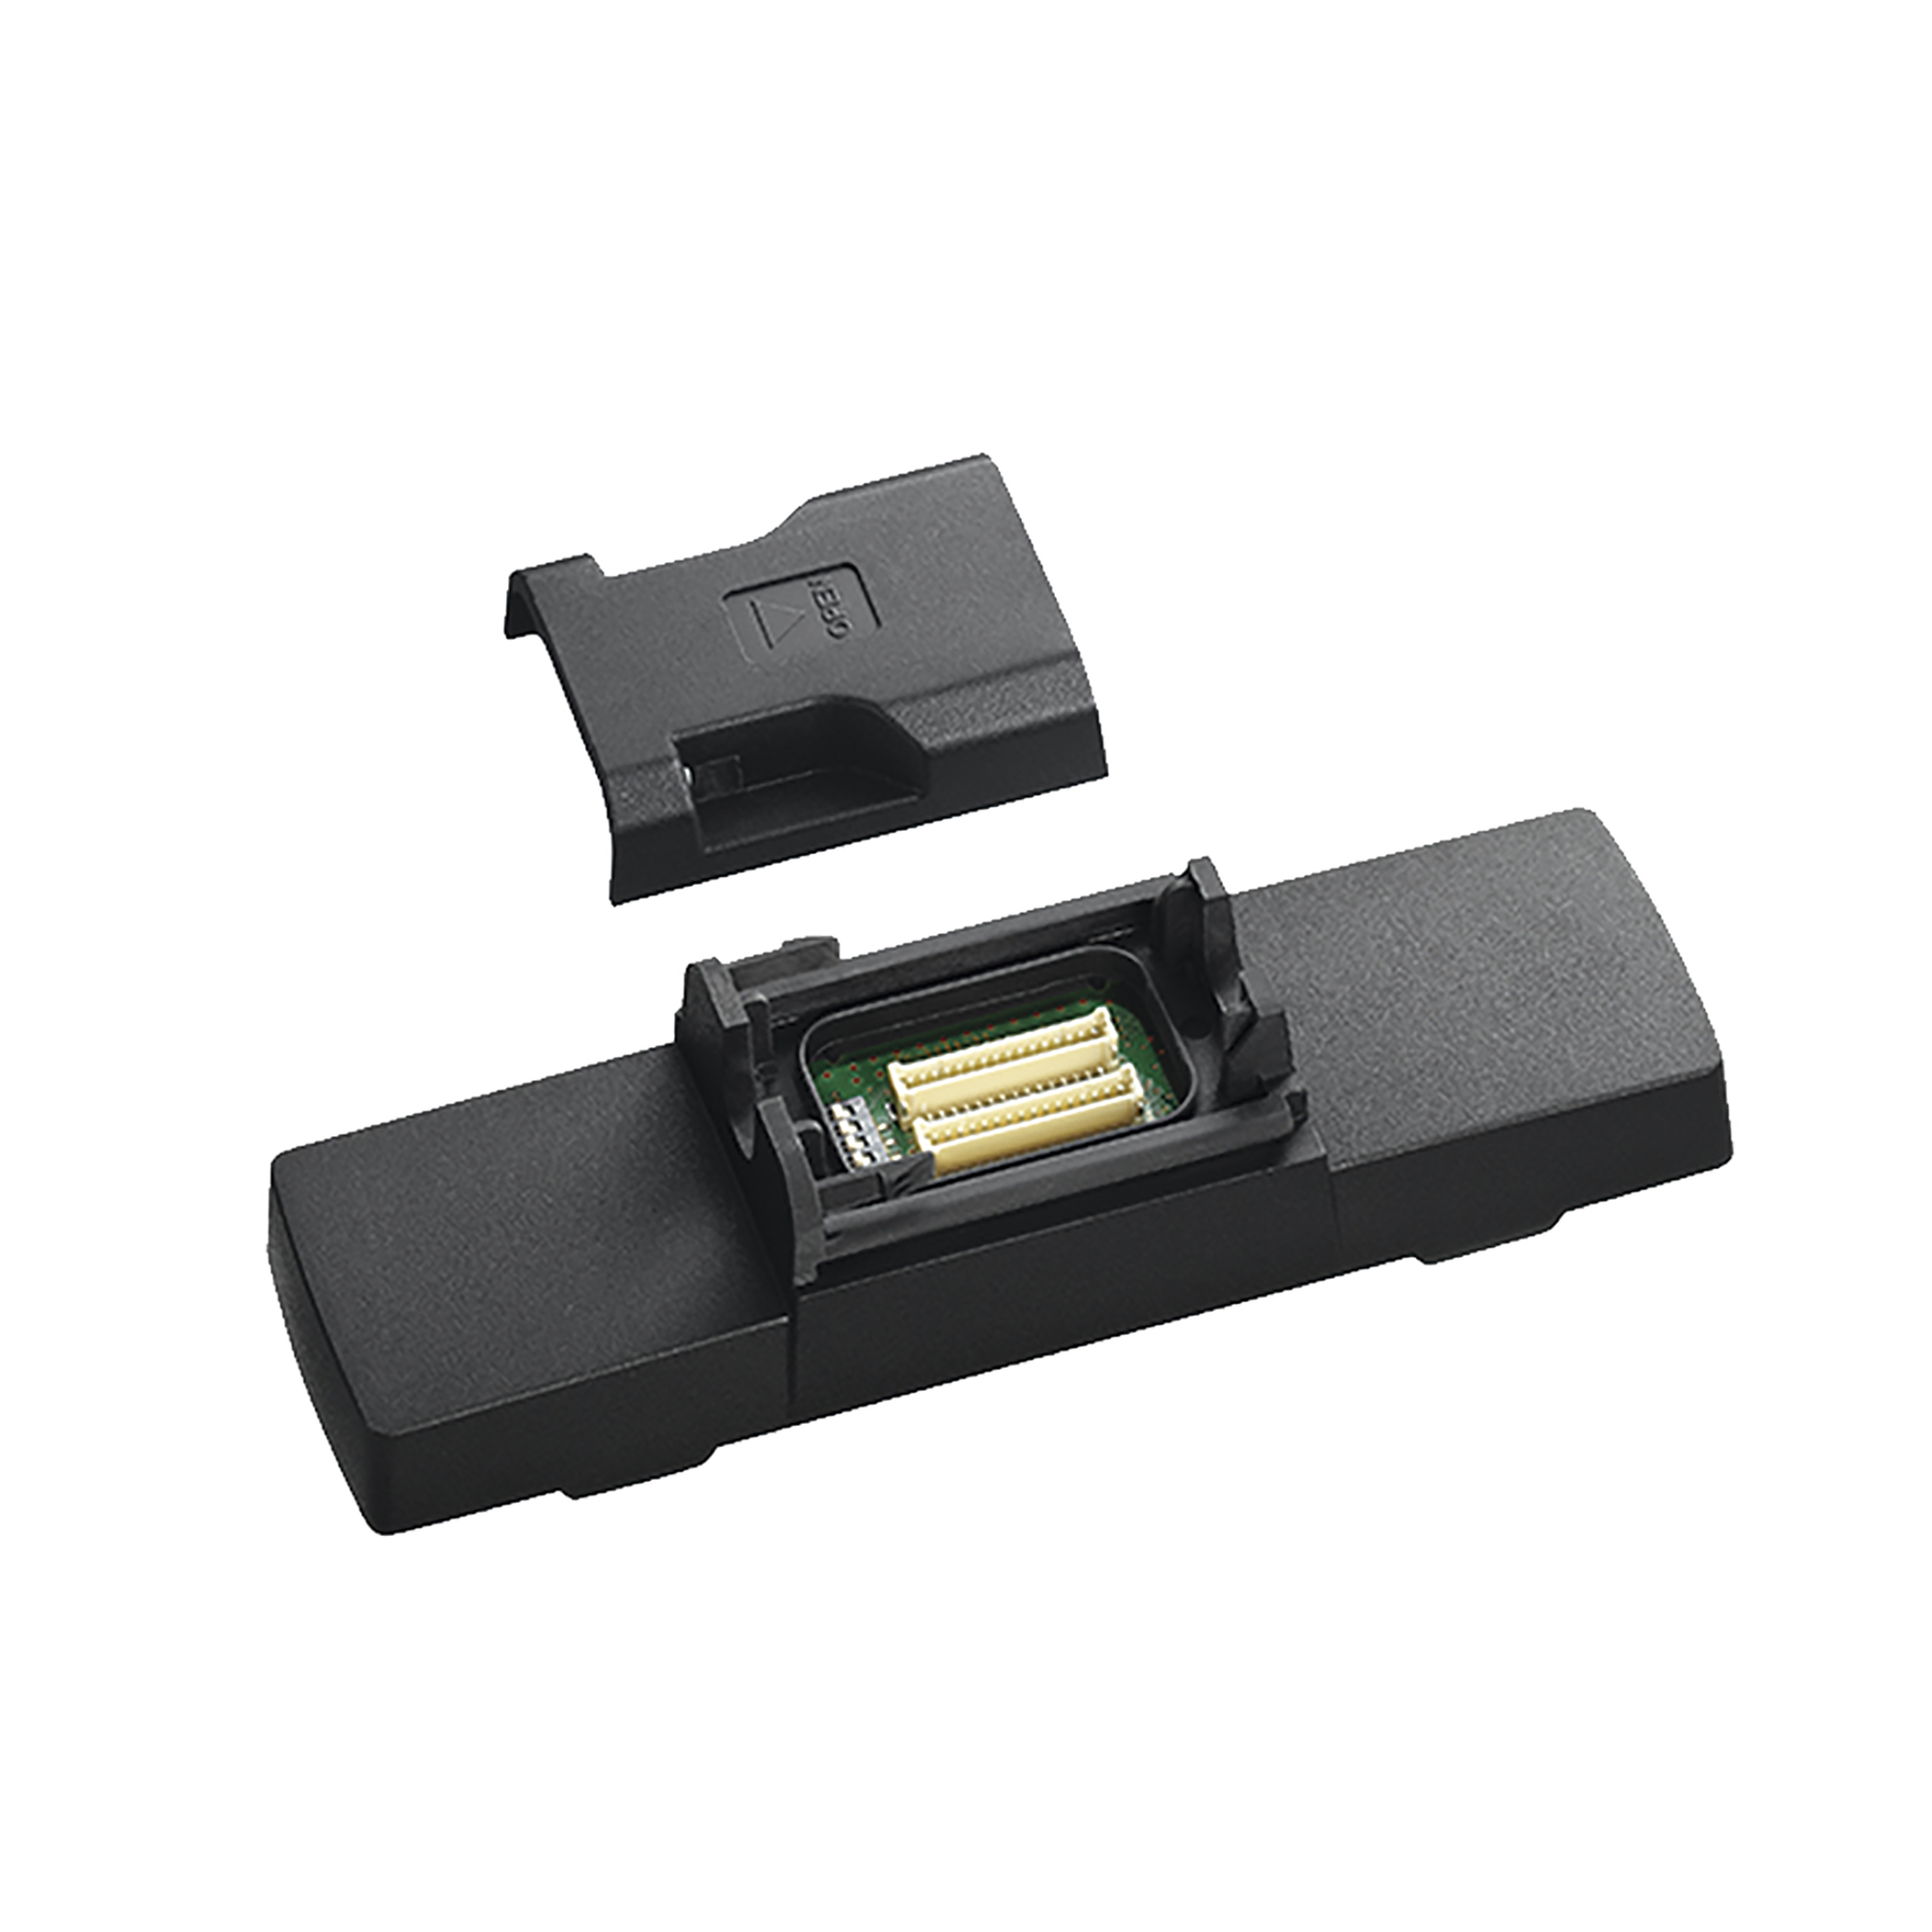 Interfaz para radio móvil remoto serie NX-3000